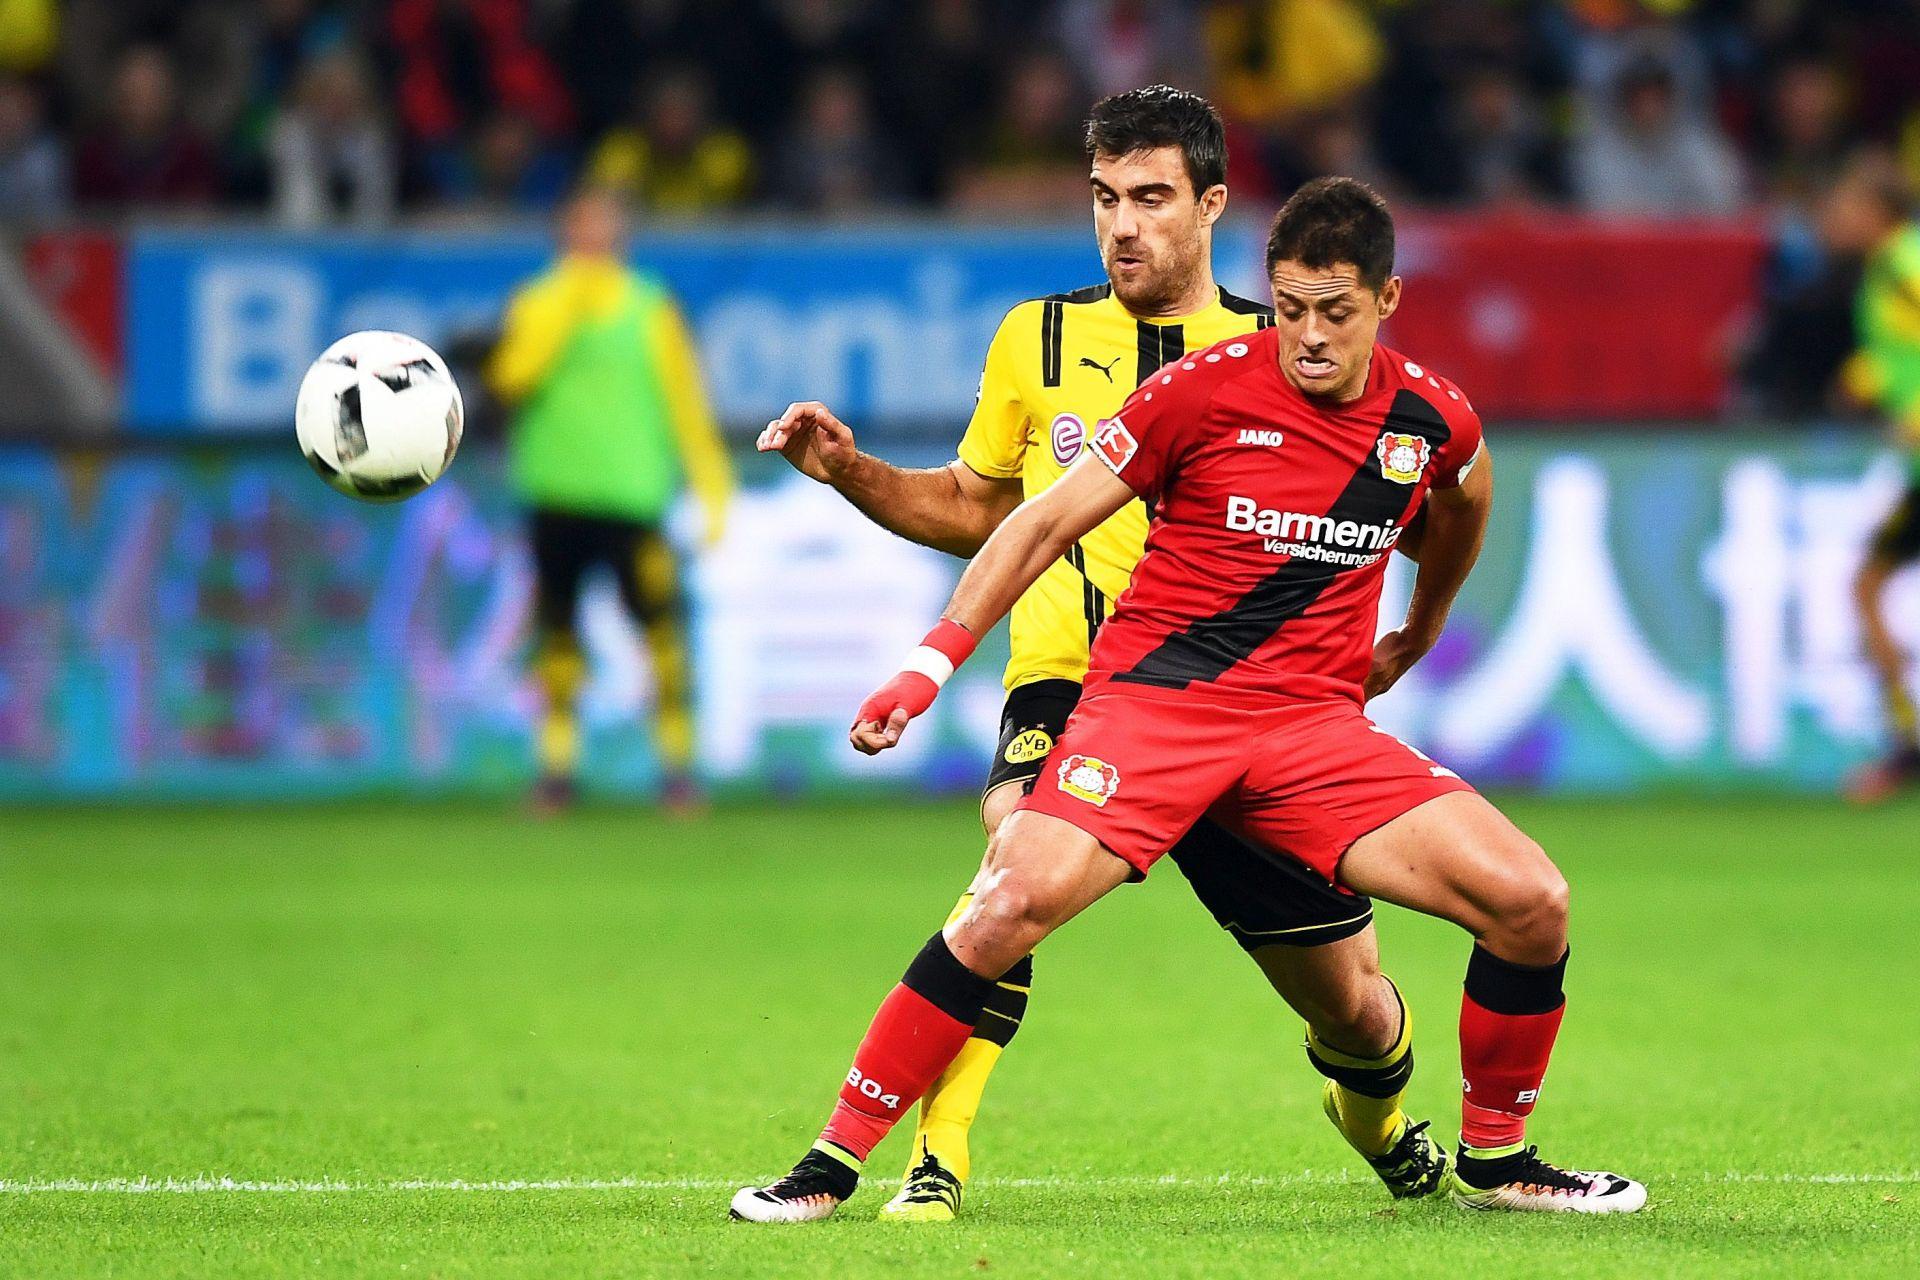 BUNDESLIGA Bayer Leverkusen – Borussia Dortmund 2:0